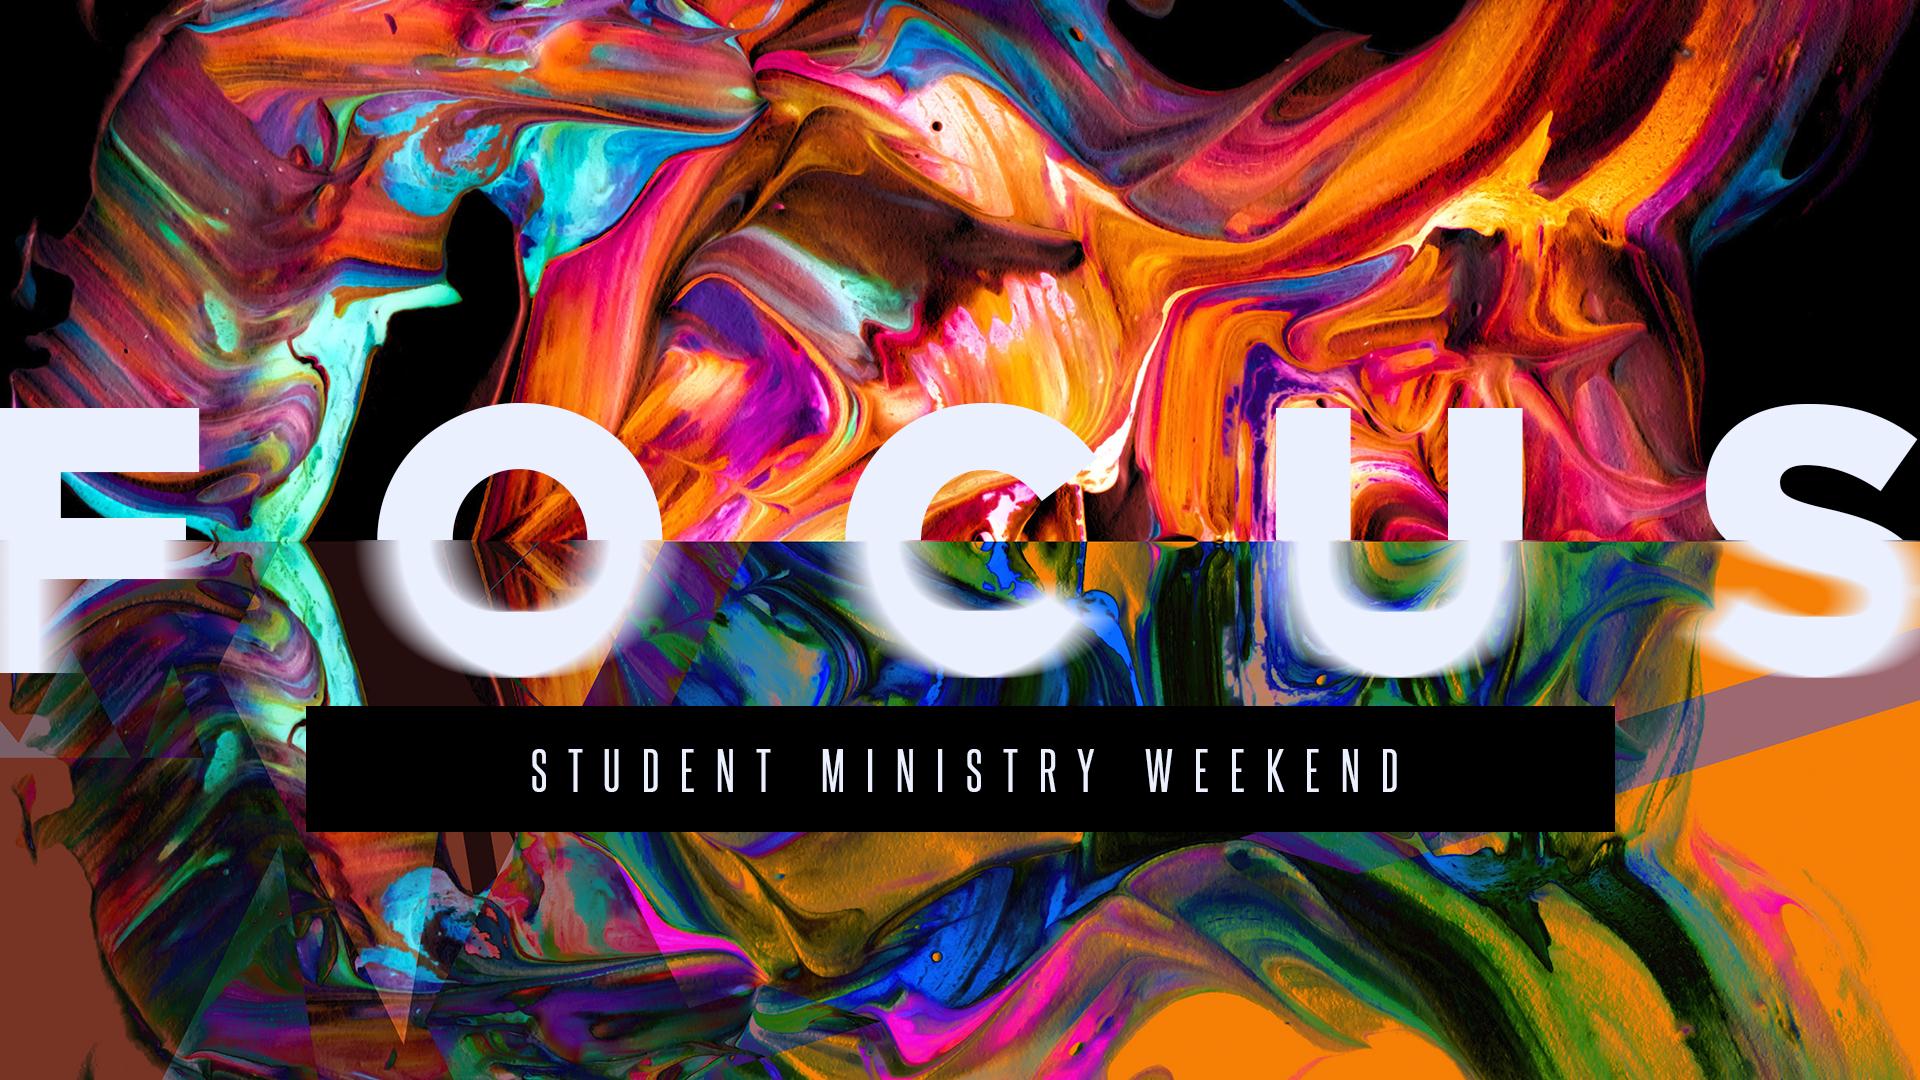 focus-2018-1920x1080.jpg